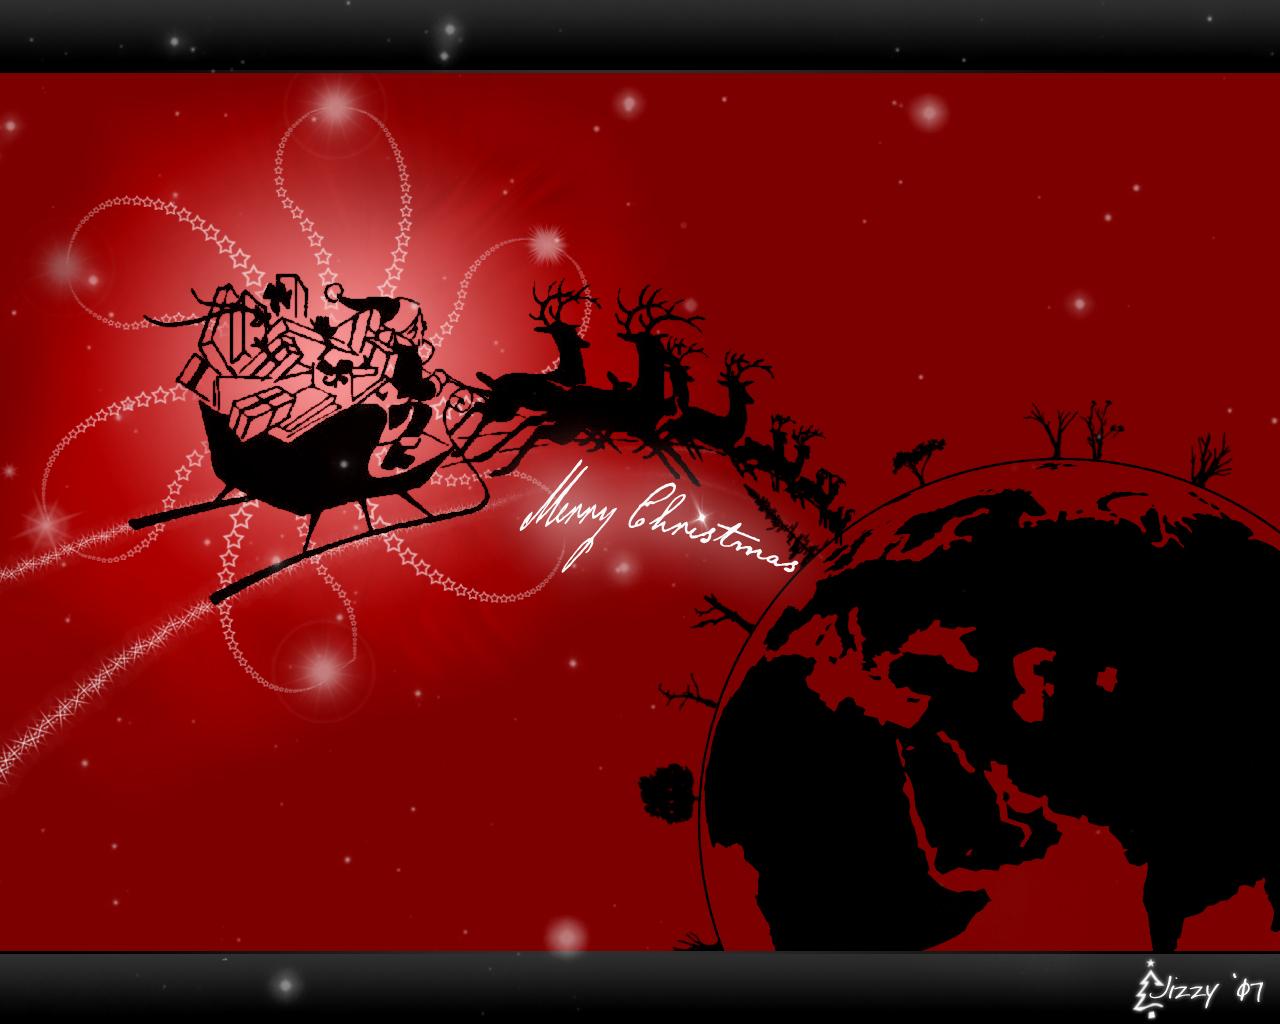 Weihnachten Wallpaper.Windows Wallpaper Weihnachten Wallpaper 07